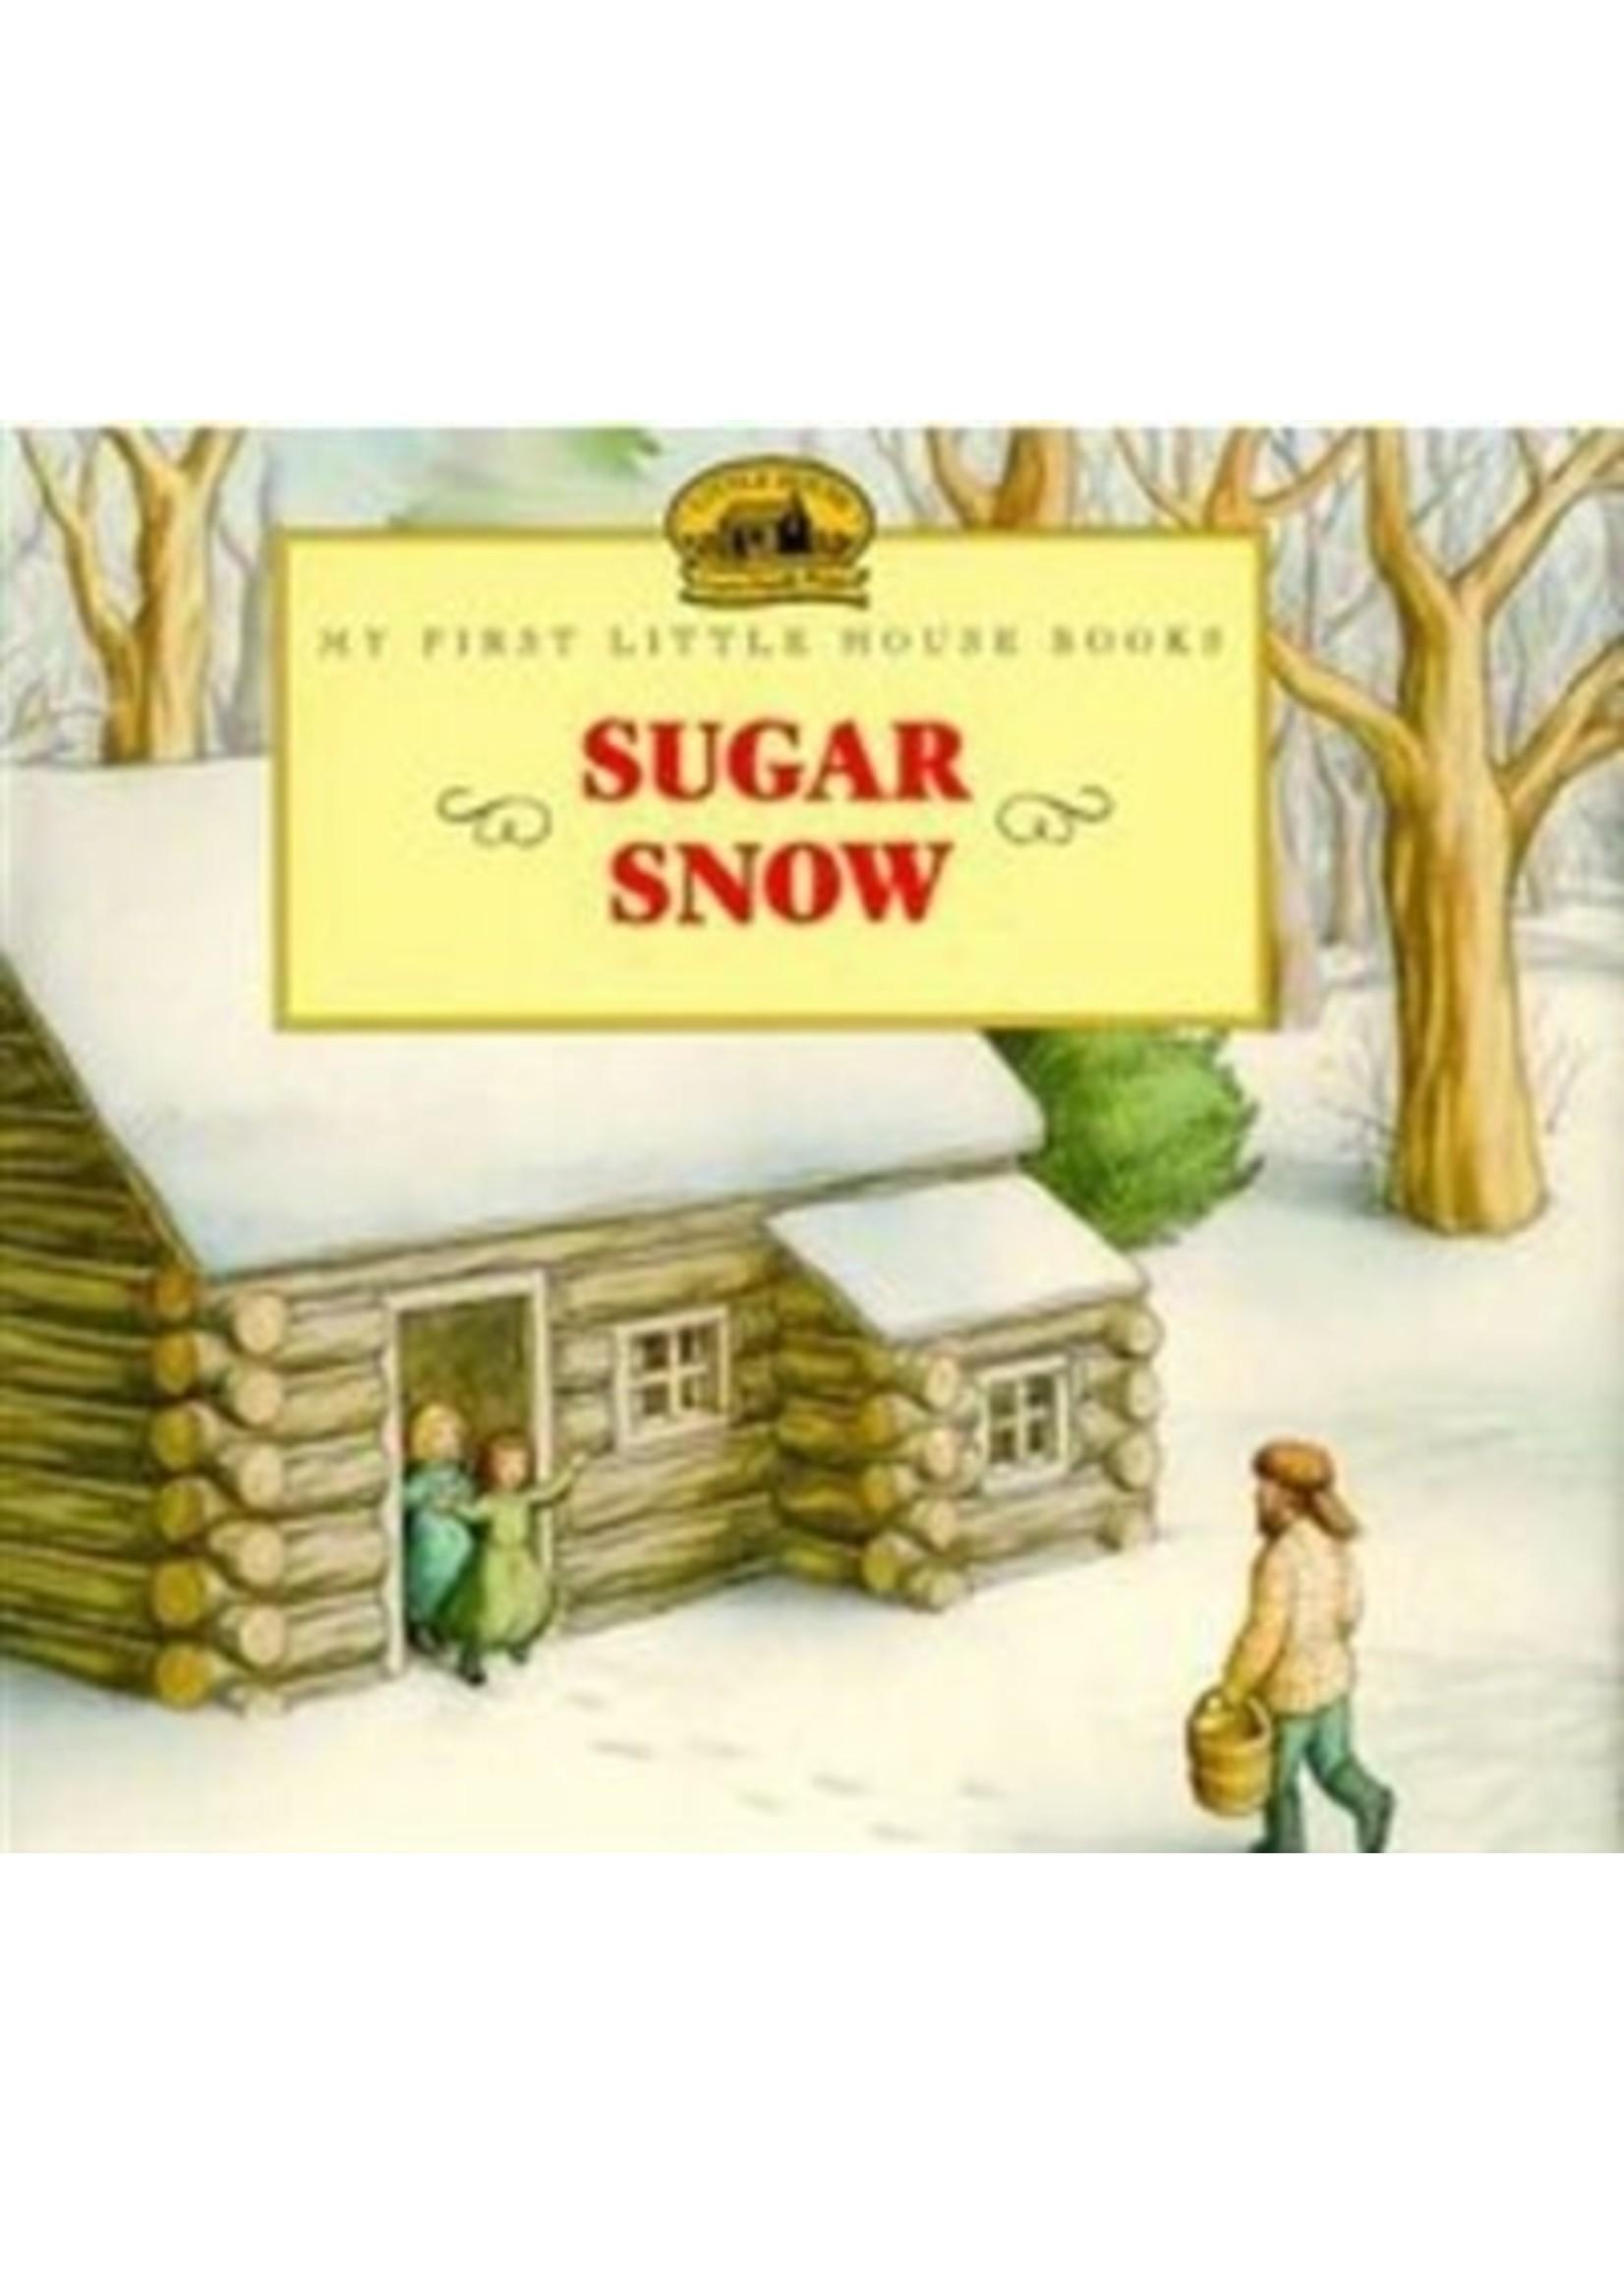 Sugar Snow -My First Little House Book